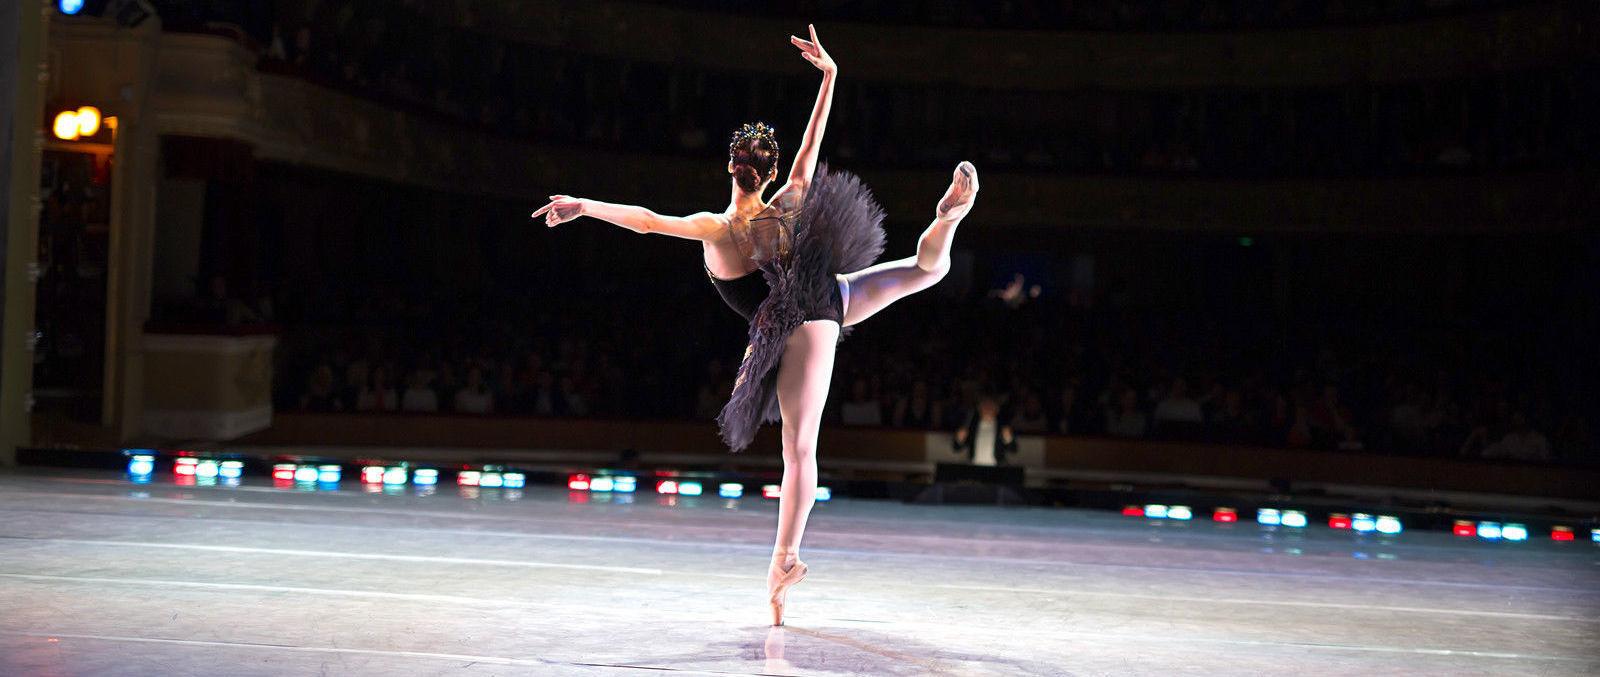 Houston Ballet Presents the Nutcracker Houston   Houston, TX   Wortham  Center   December 10, 2017